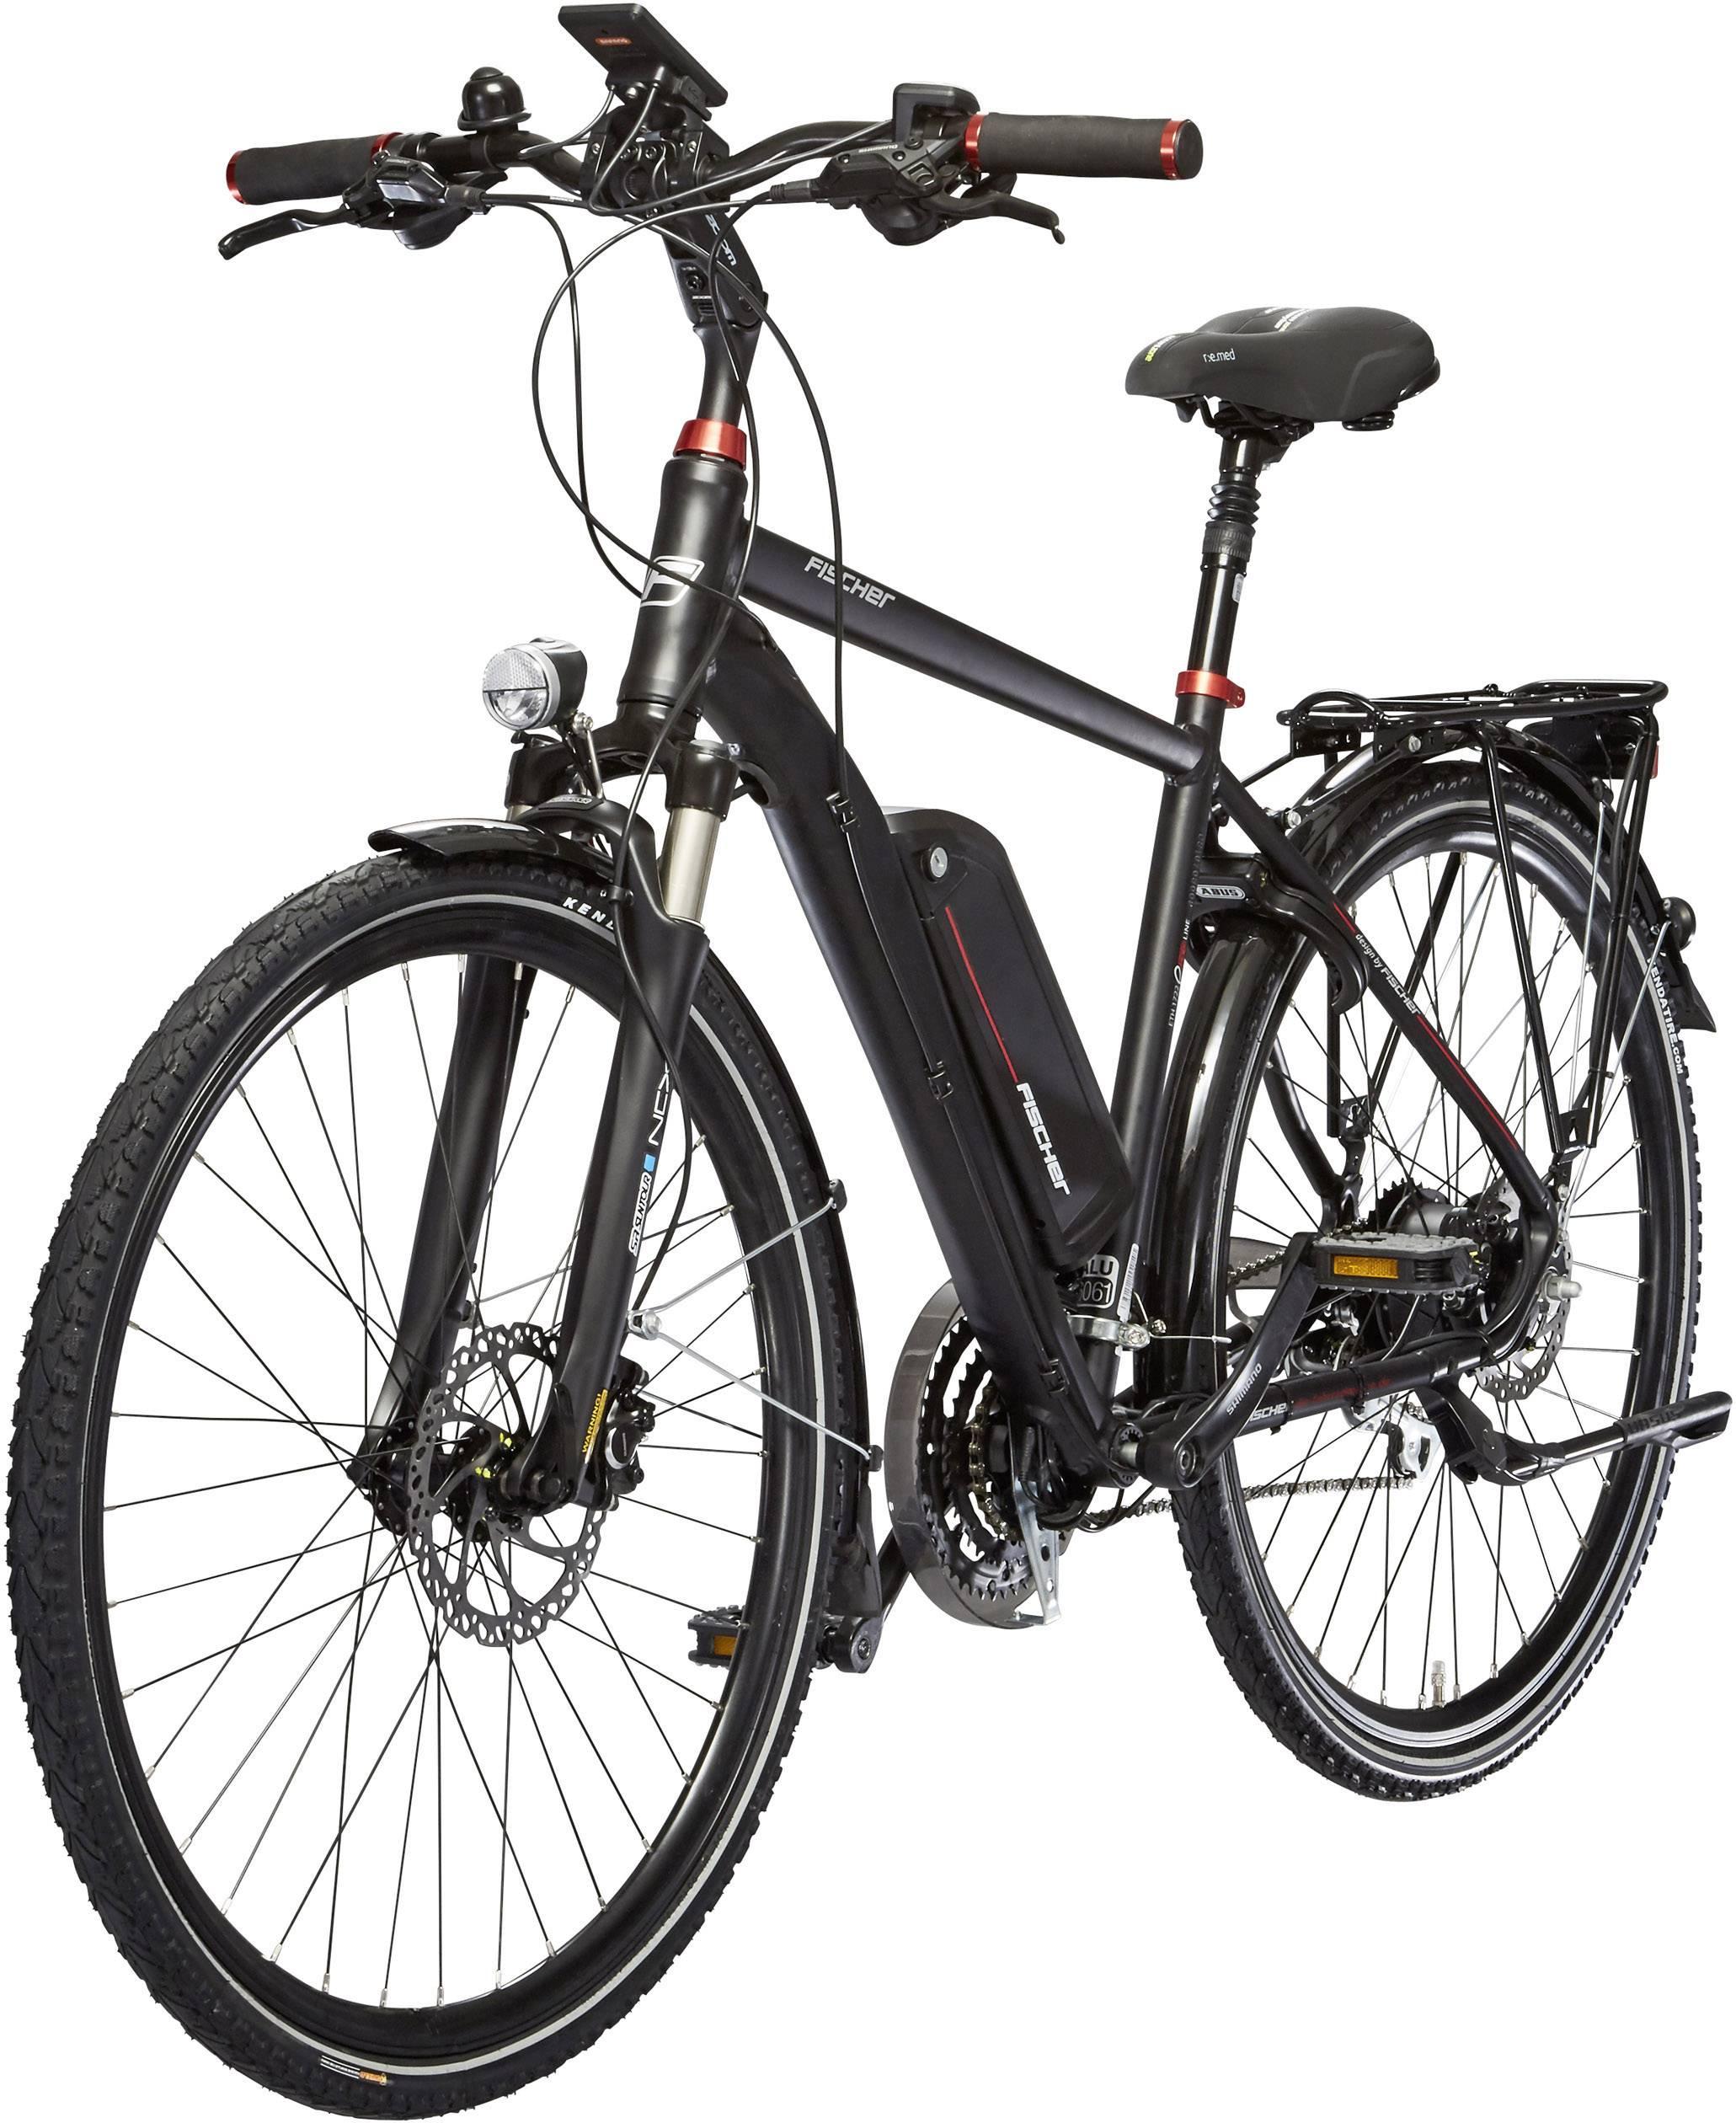 trekking fahrrad herren interesting nur eur eur ab alu. Black Bedroom Furniture Sets. Home Design Ideas